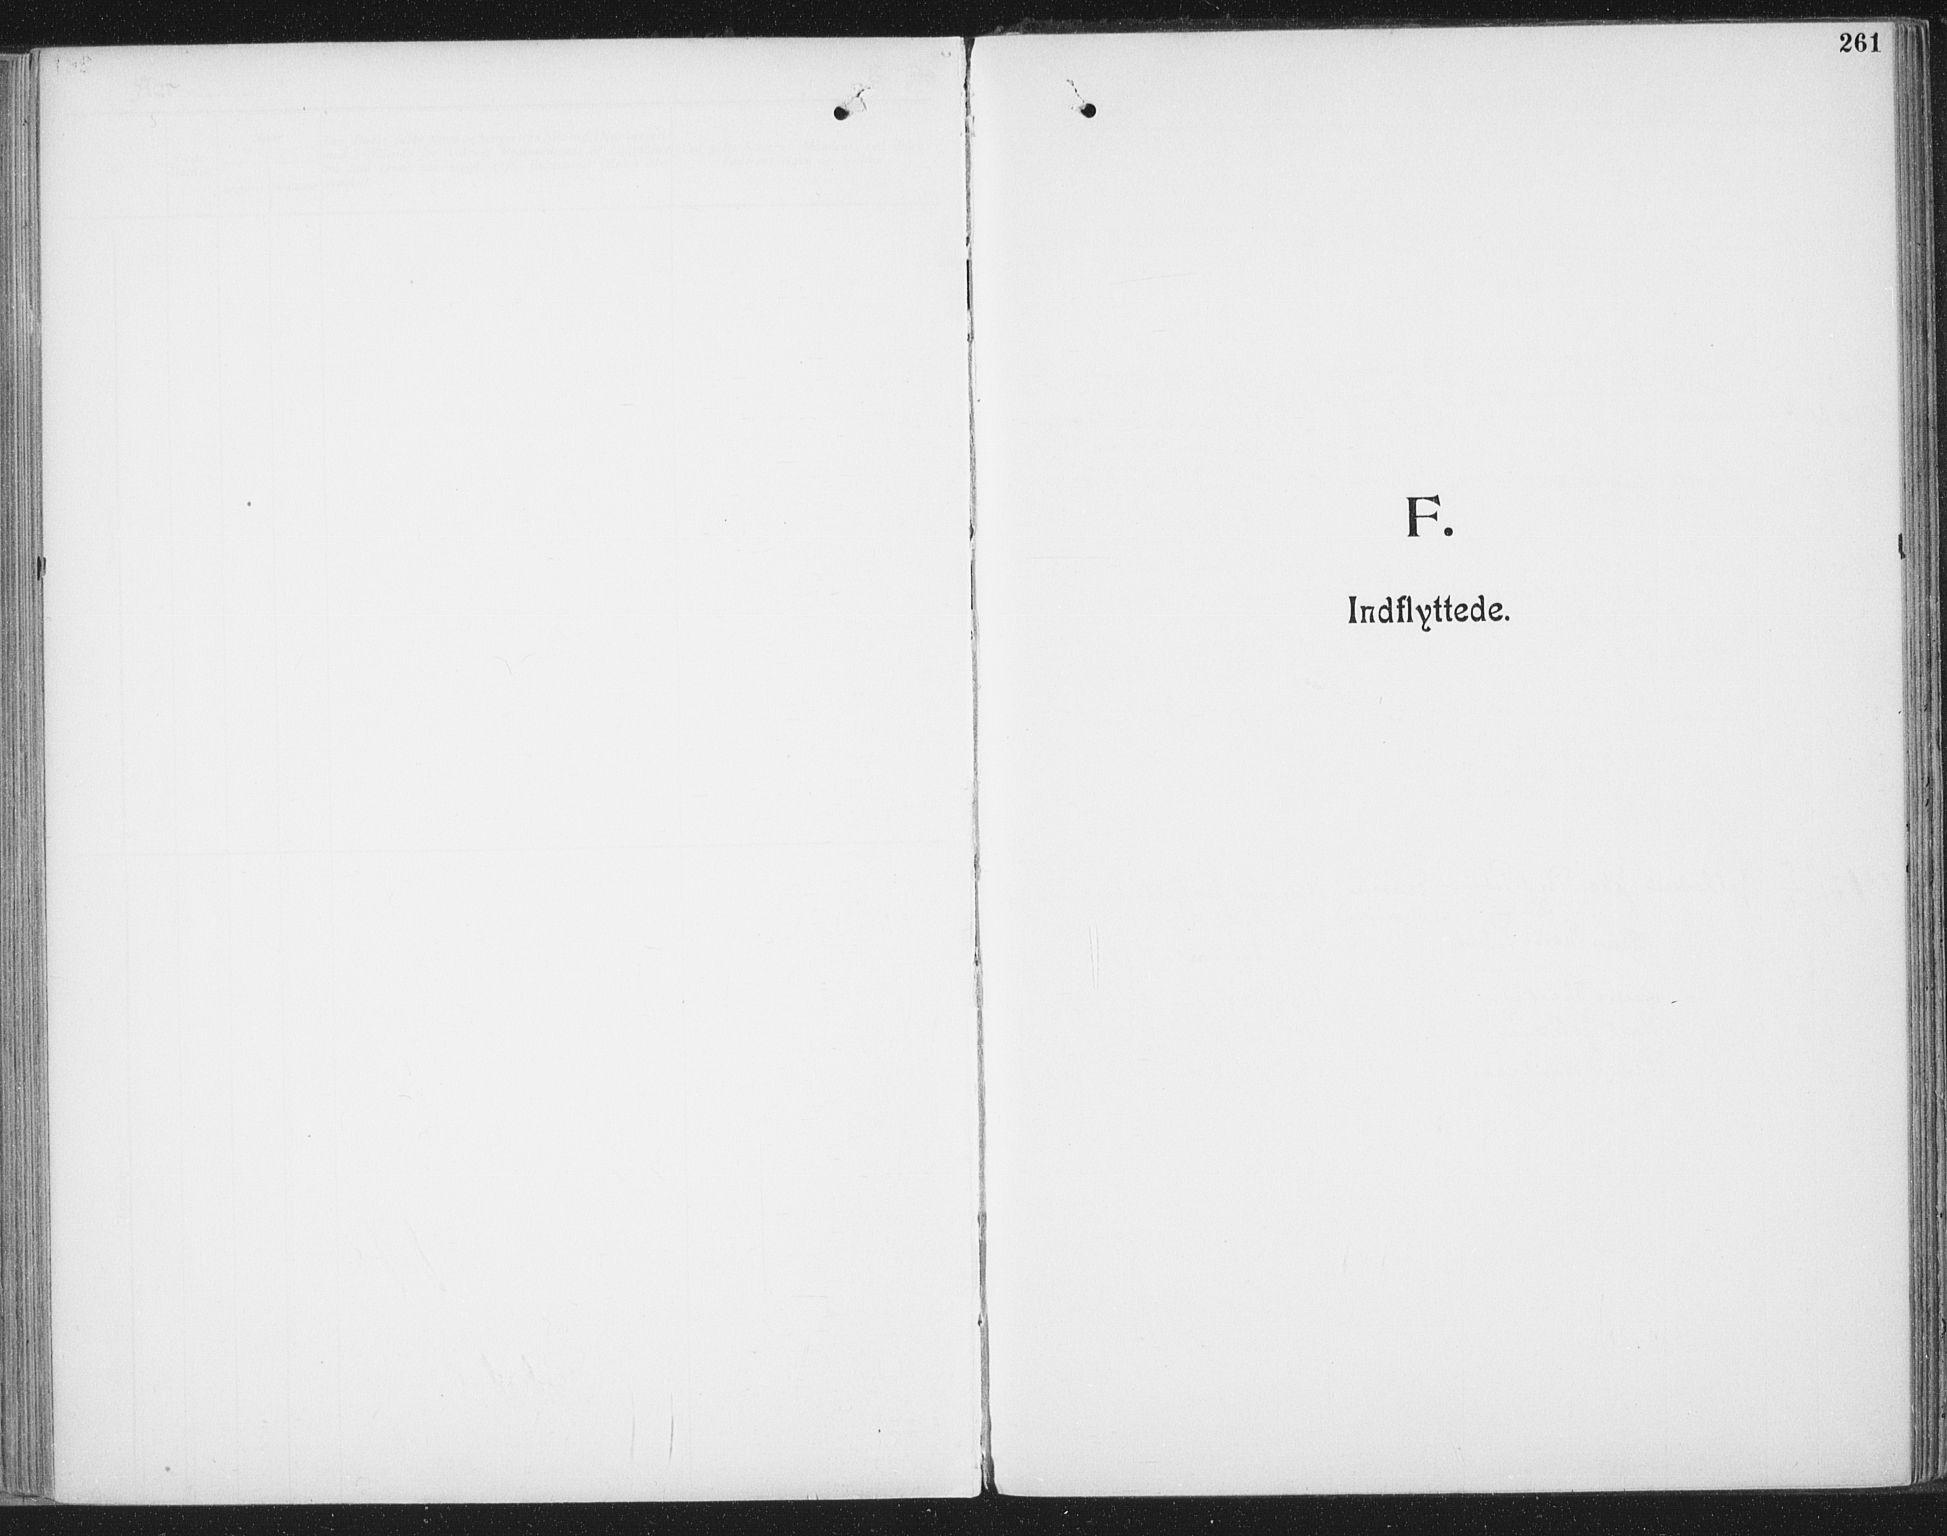 SAT, Ministerialprotokoller, klokkerbøker og fødselsregistre - Nordland, 804/L0081: Ministerialbok nr. 804A02, 1901-1915, s. 261